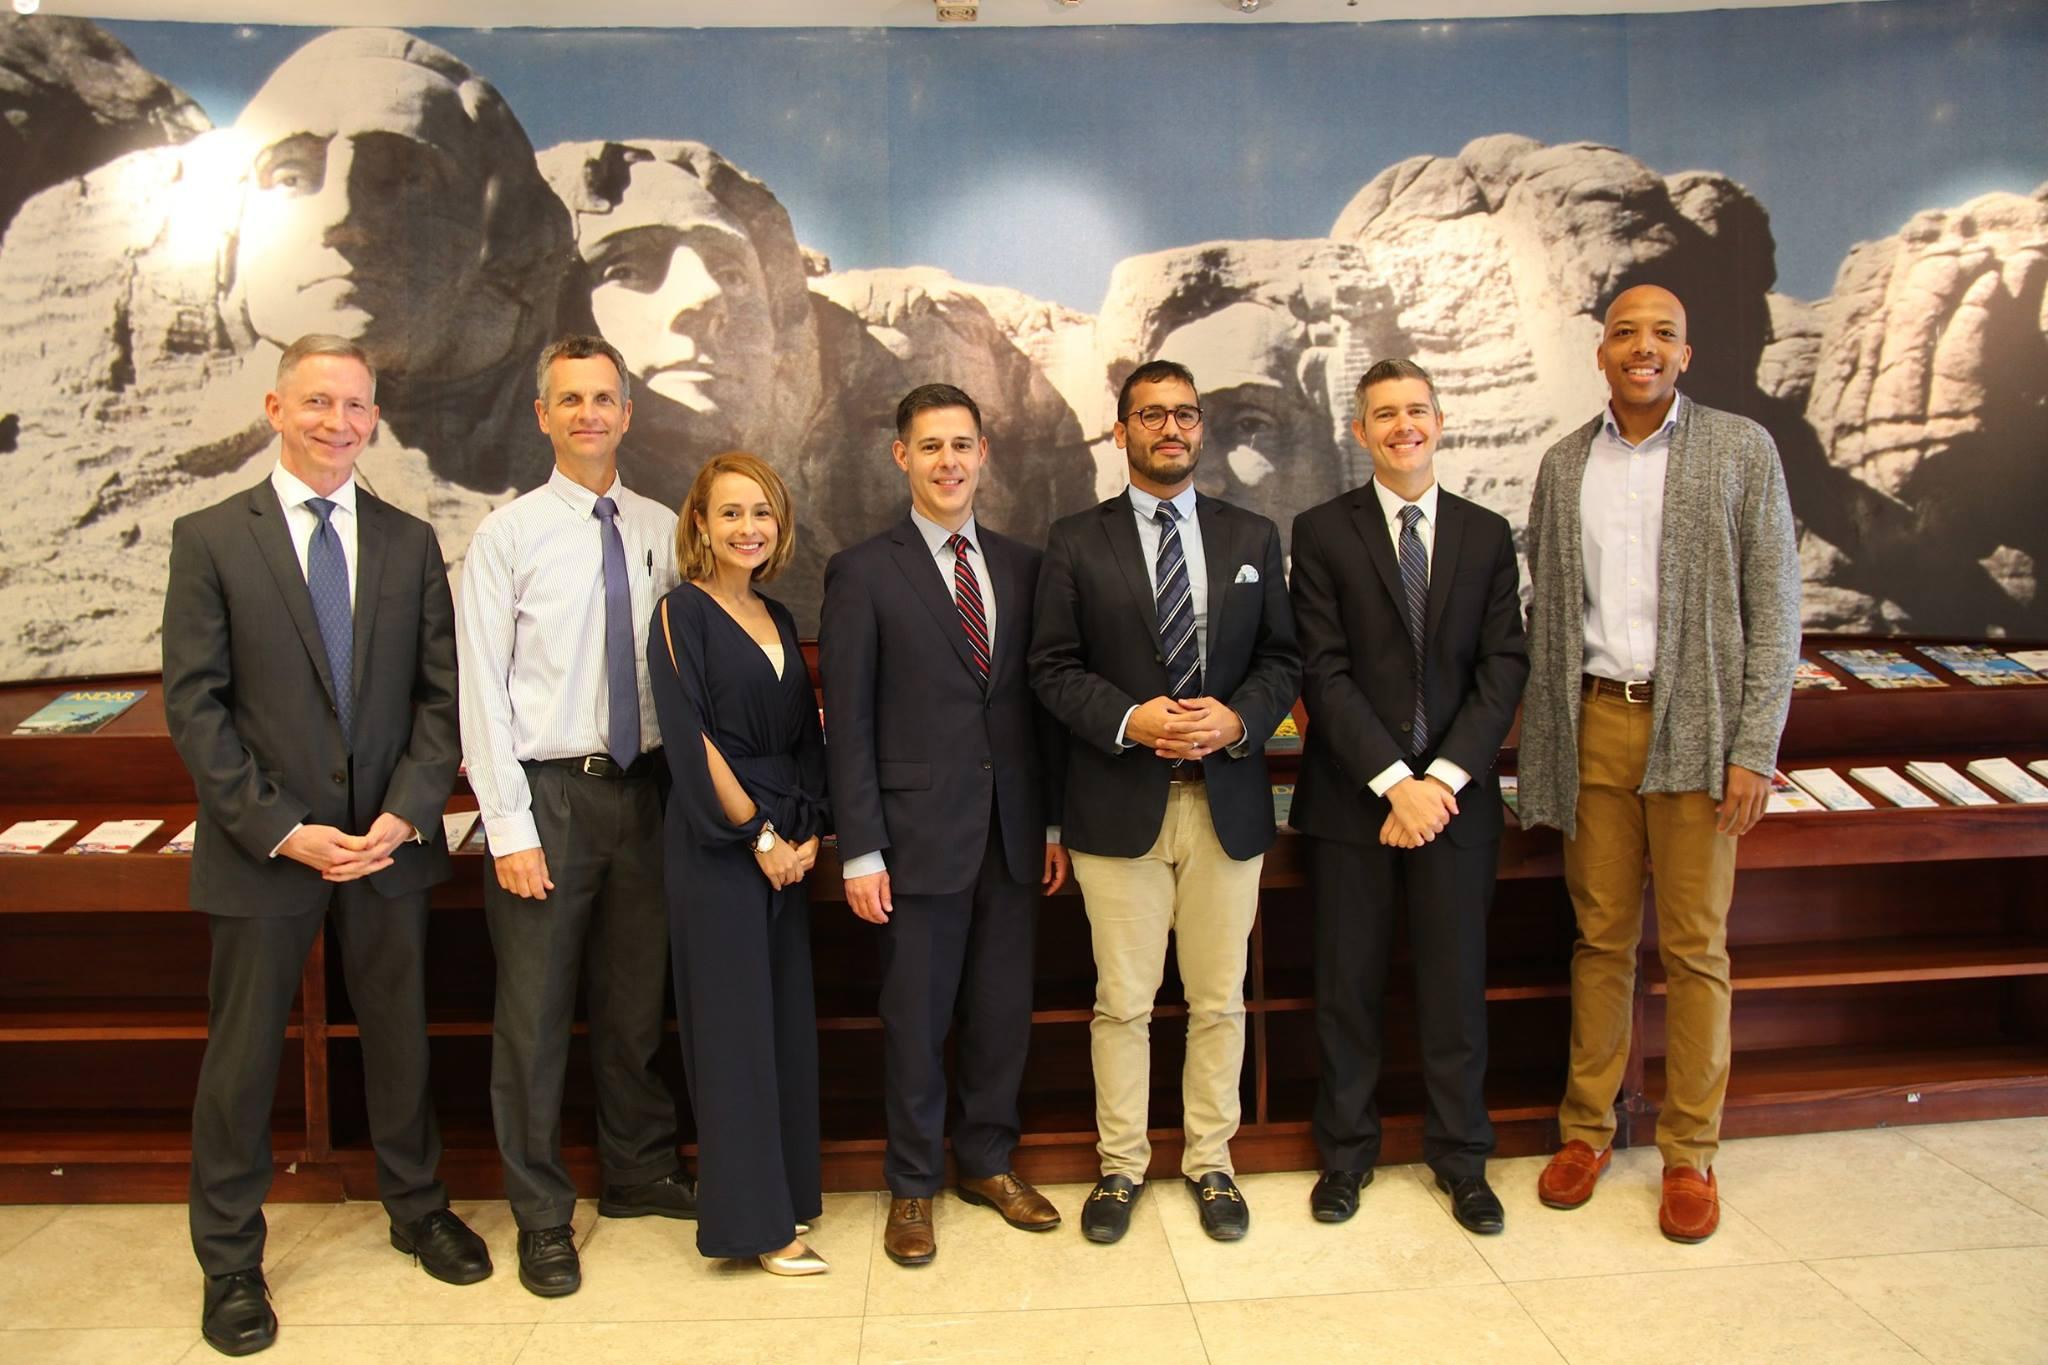 Herman-Duarte-John-Corvino-Eric-Catalfamo-Embajada-USA-Costa-Rica